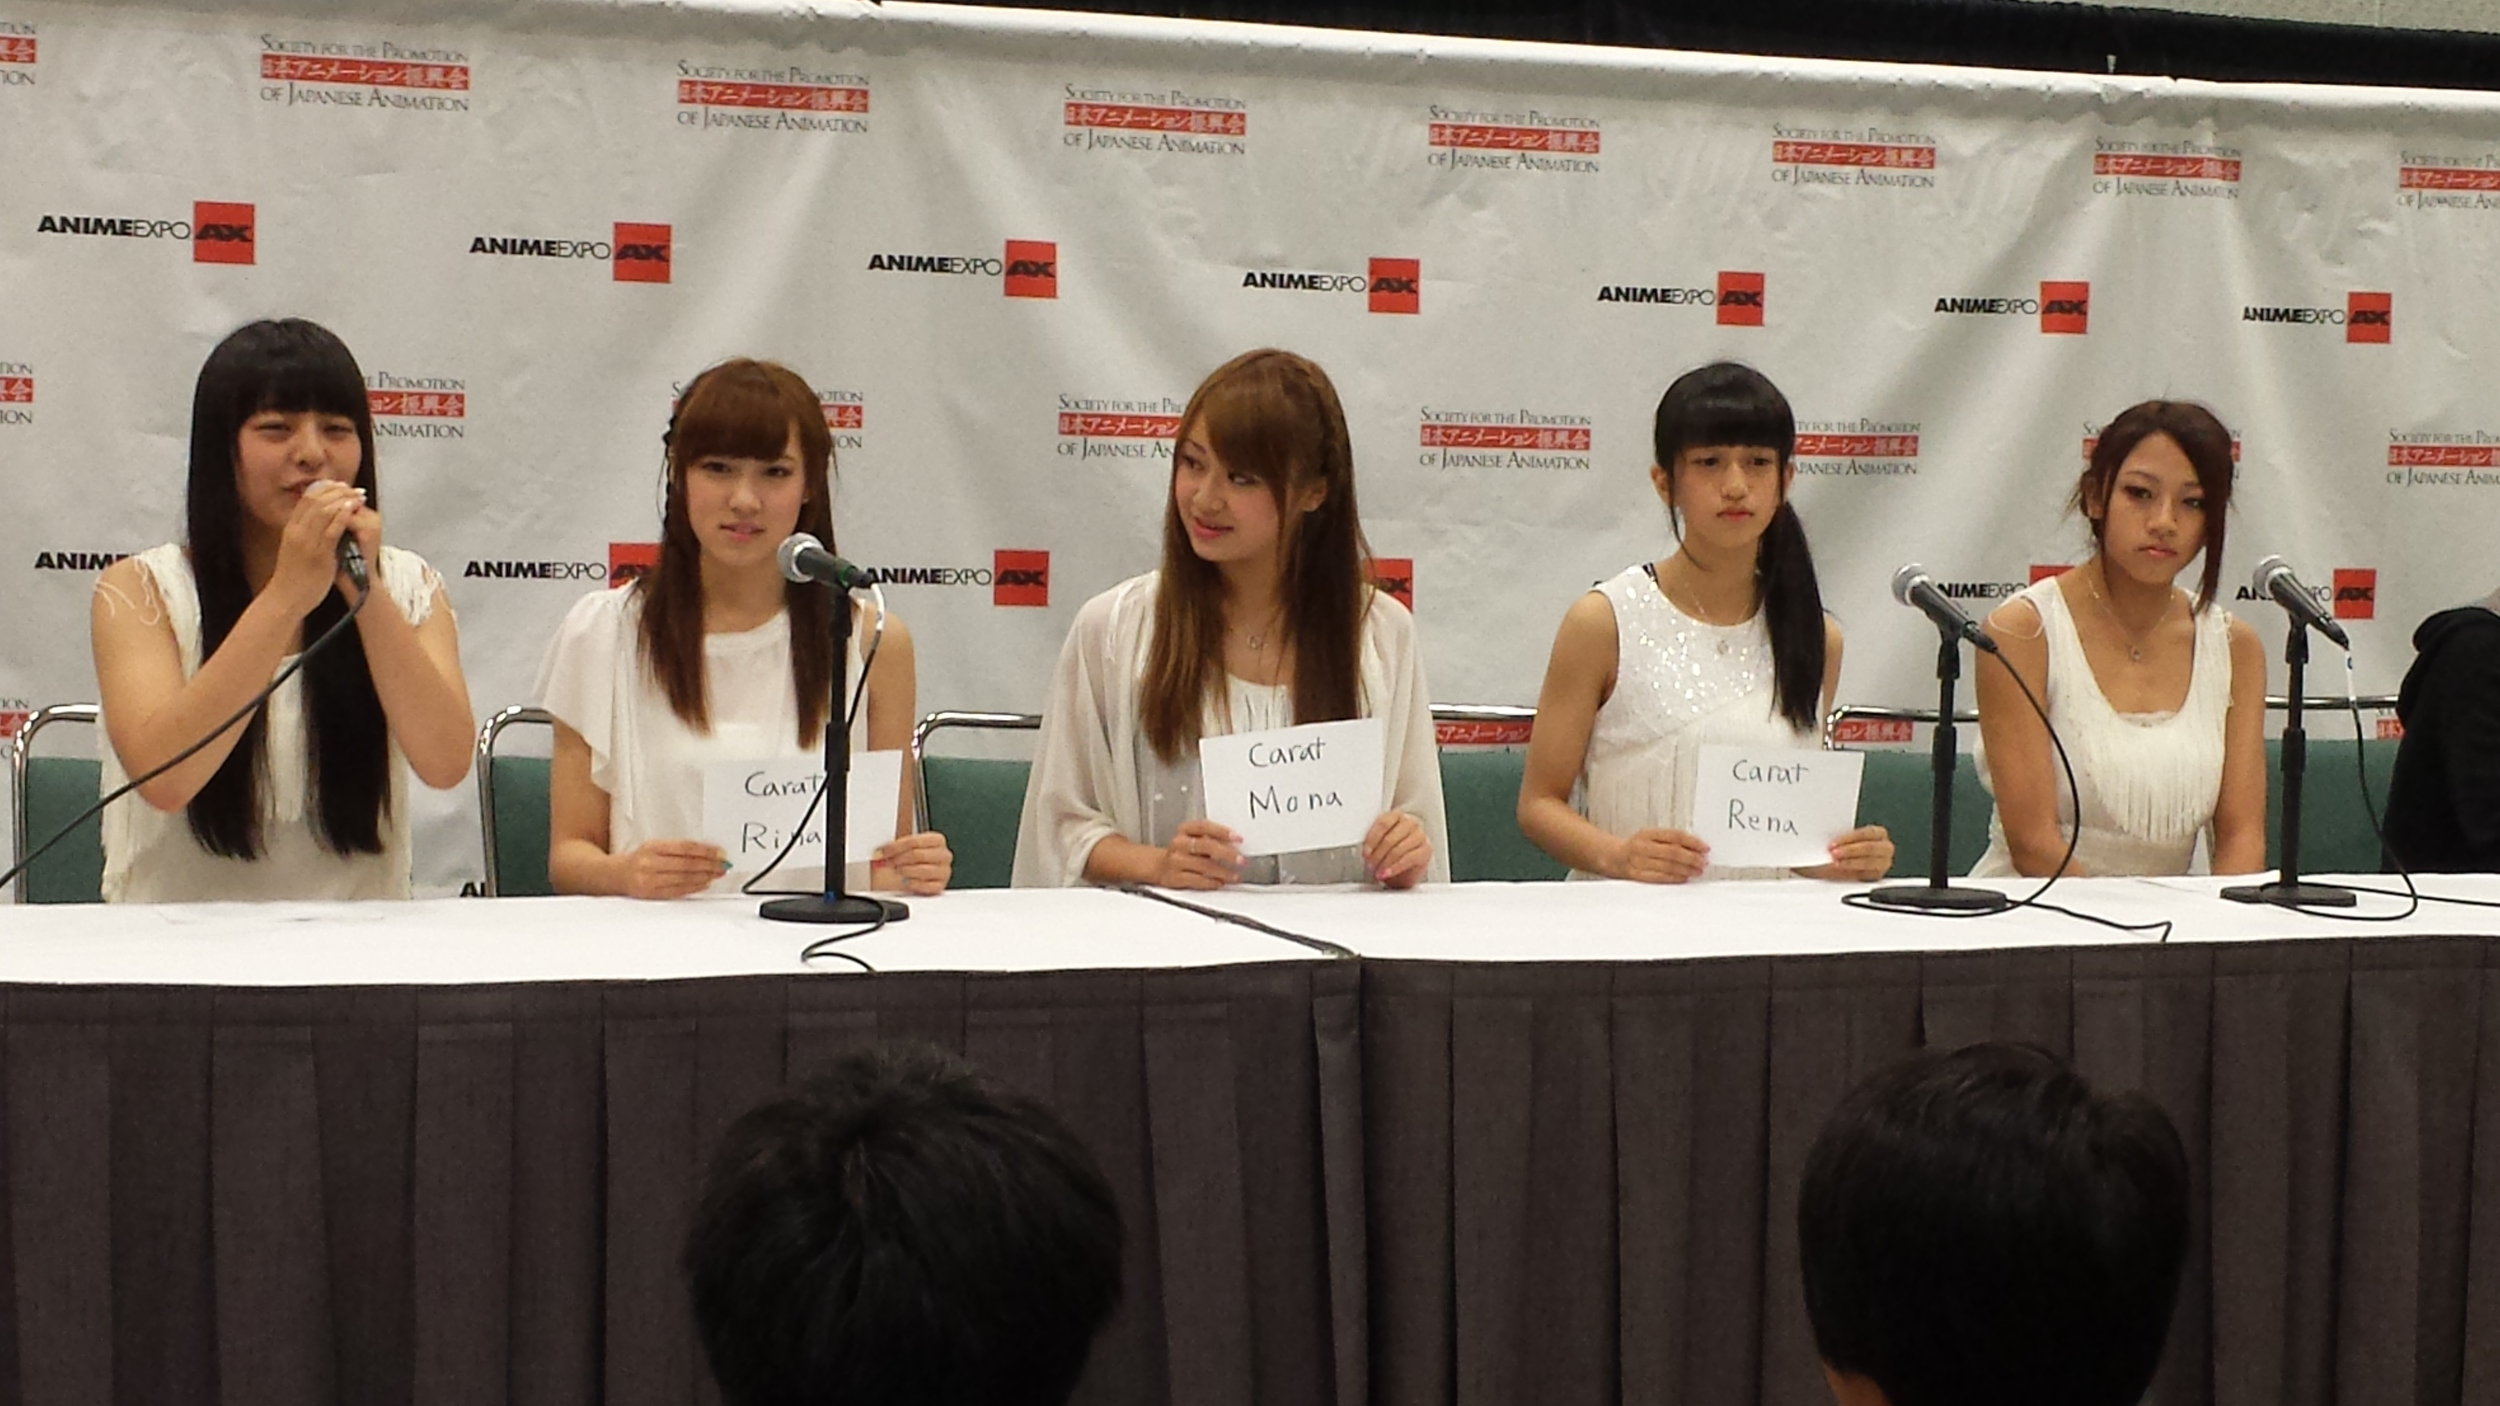 AnimeExpo 2013 - Carat Press Conference